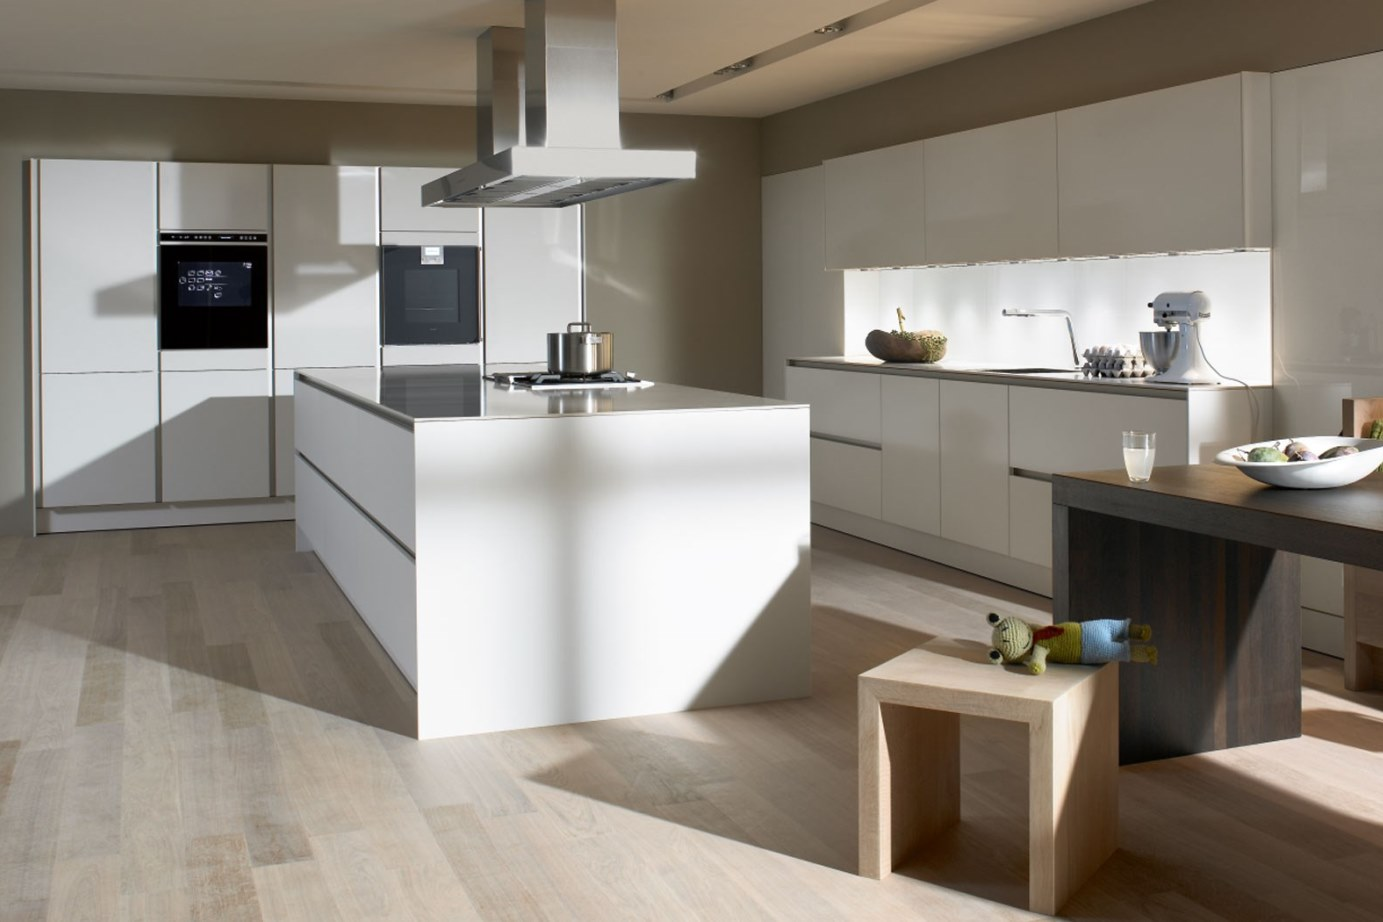 Siematic Keukens Utrecht : Siematic keukens innovatie en ongekende luxe db keukens